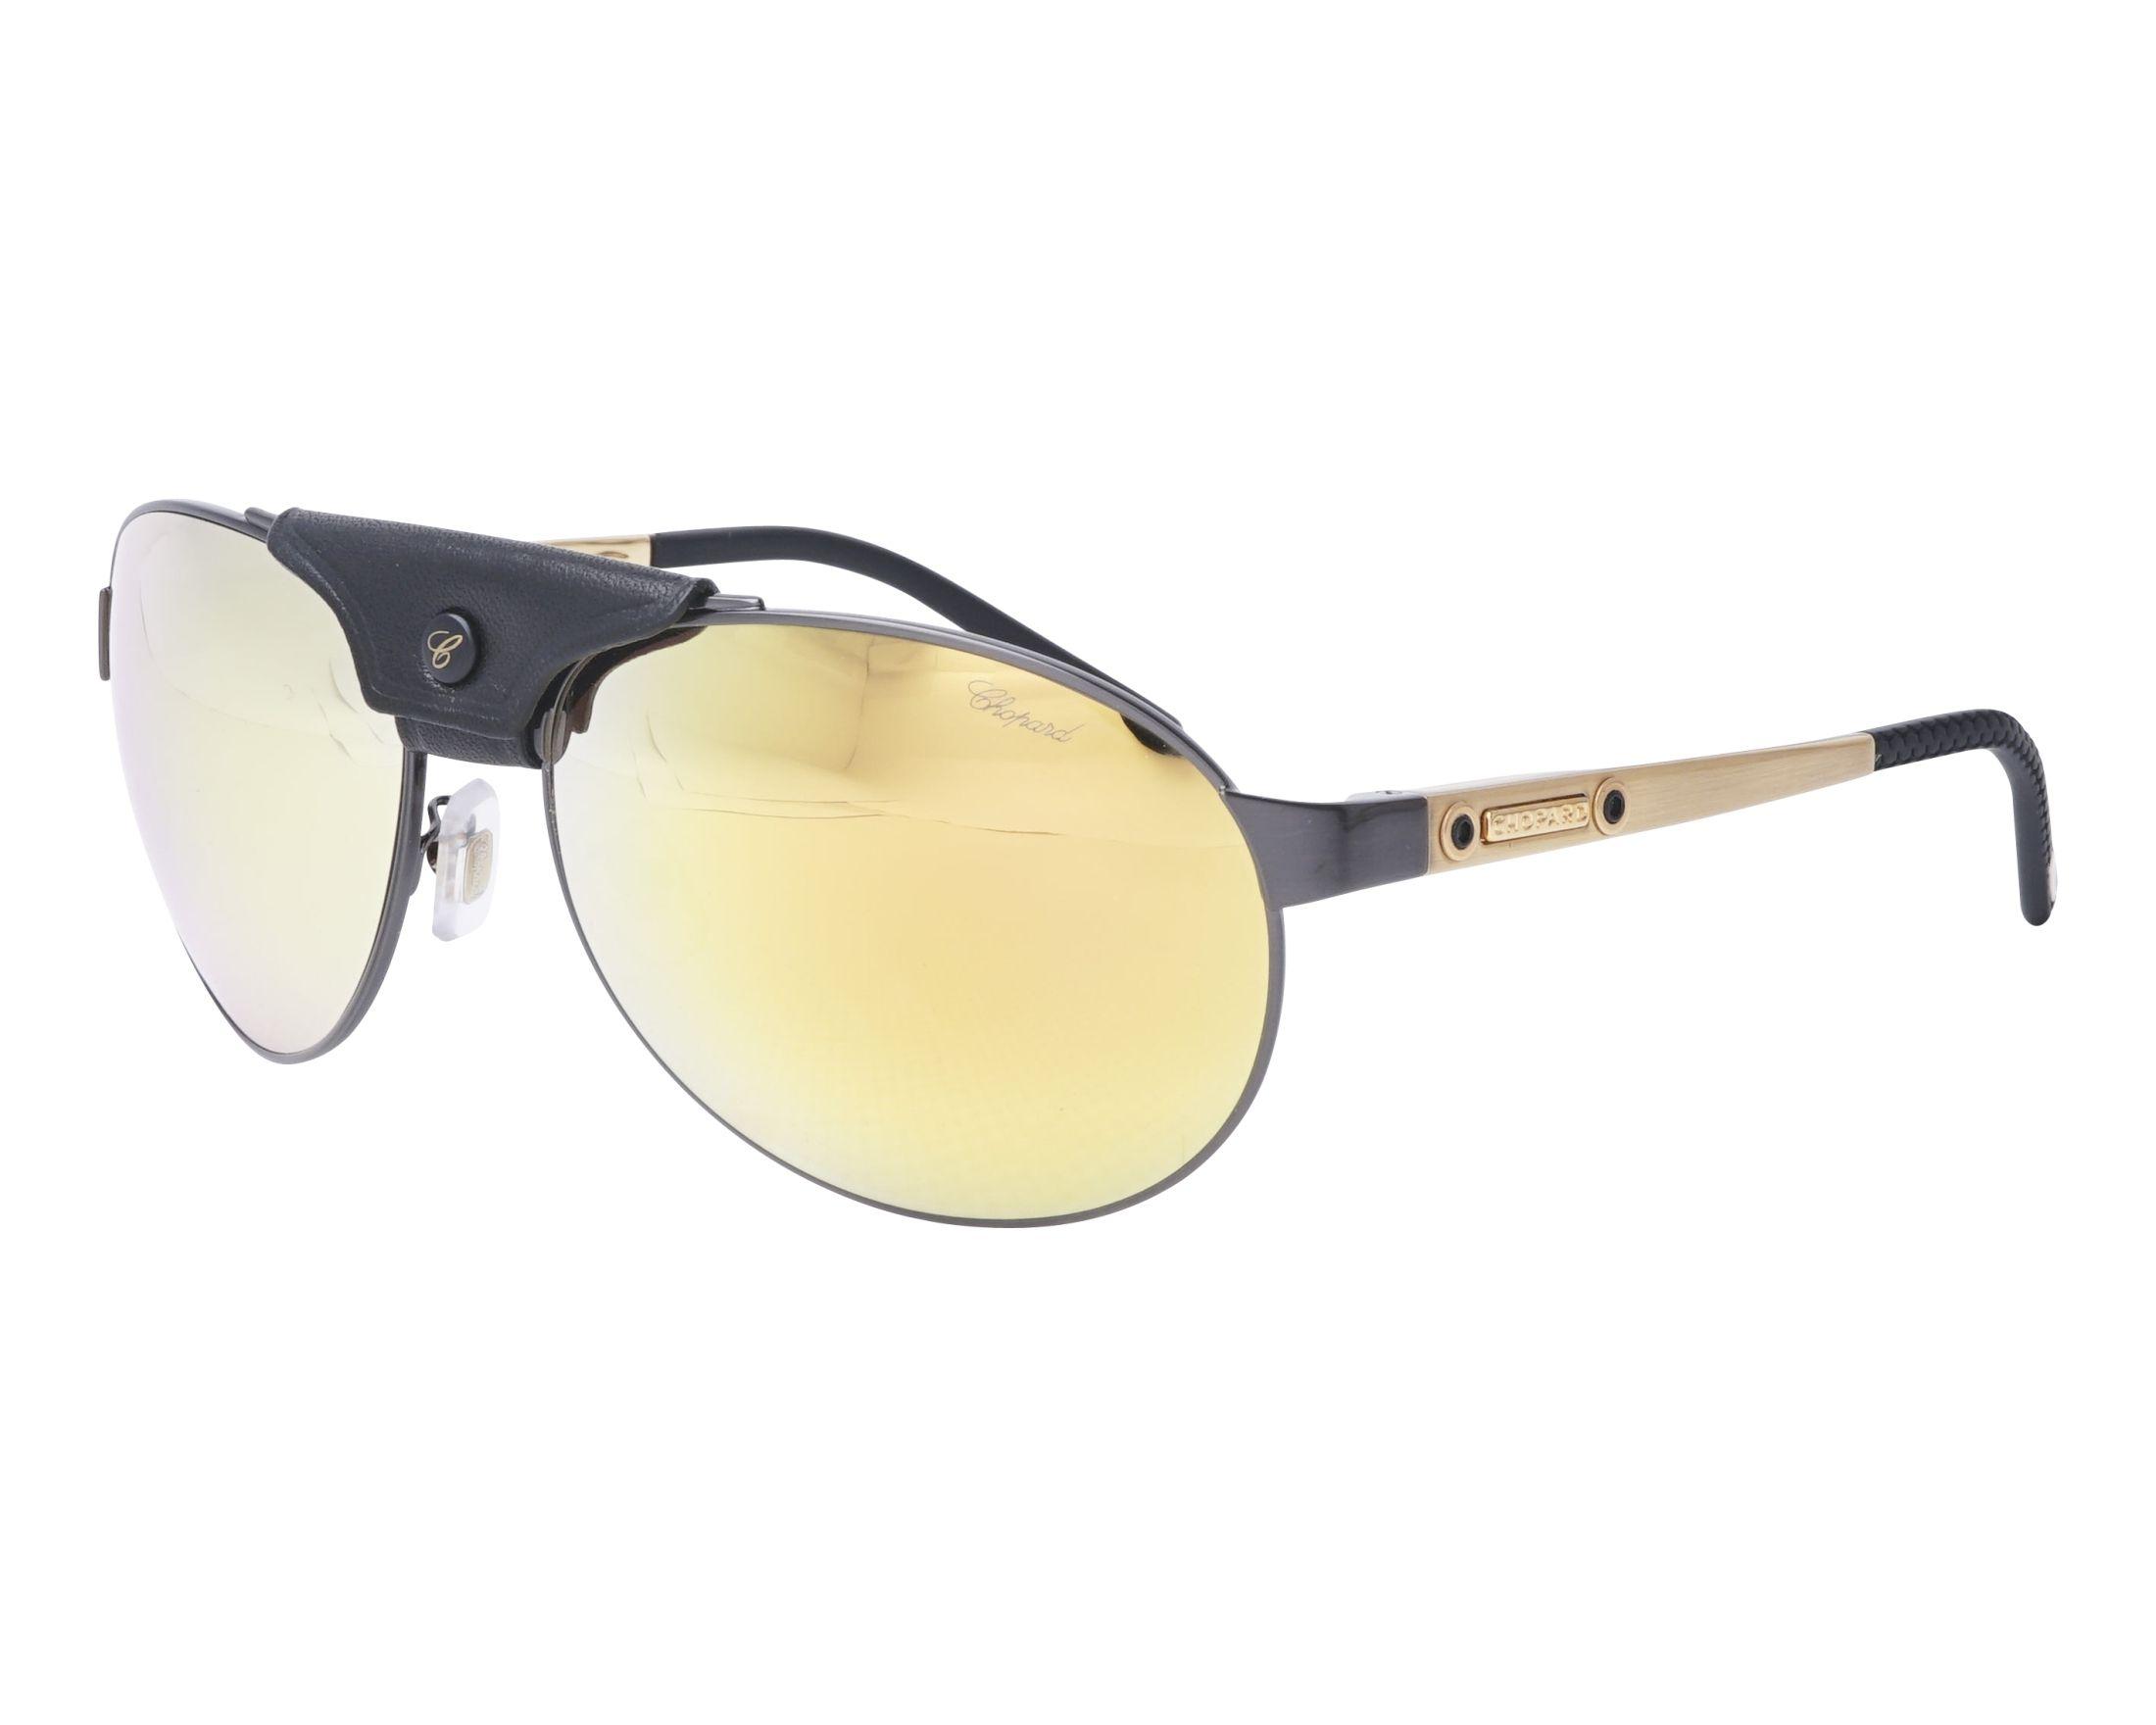 d254934af91 Polarized. Sunglasses Chopard SCH-932 K10G 62-16 Gold Black profile view